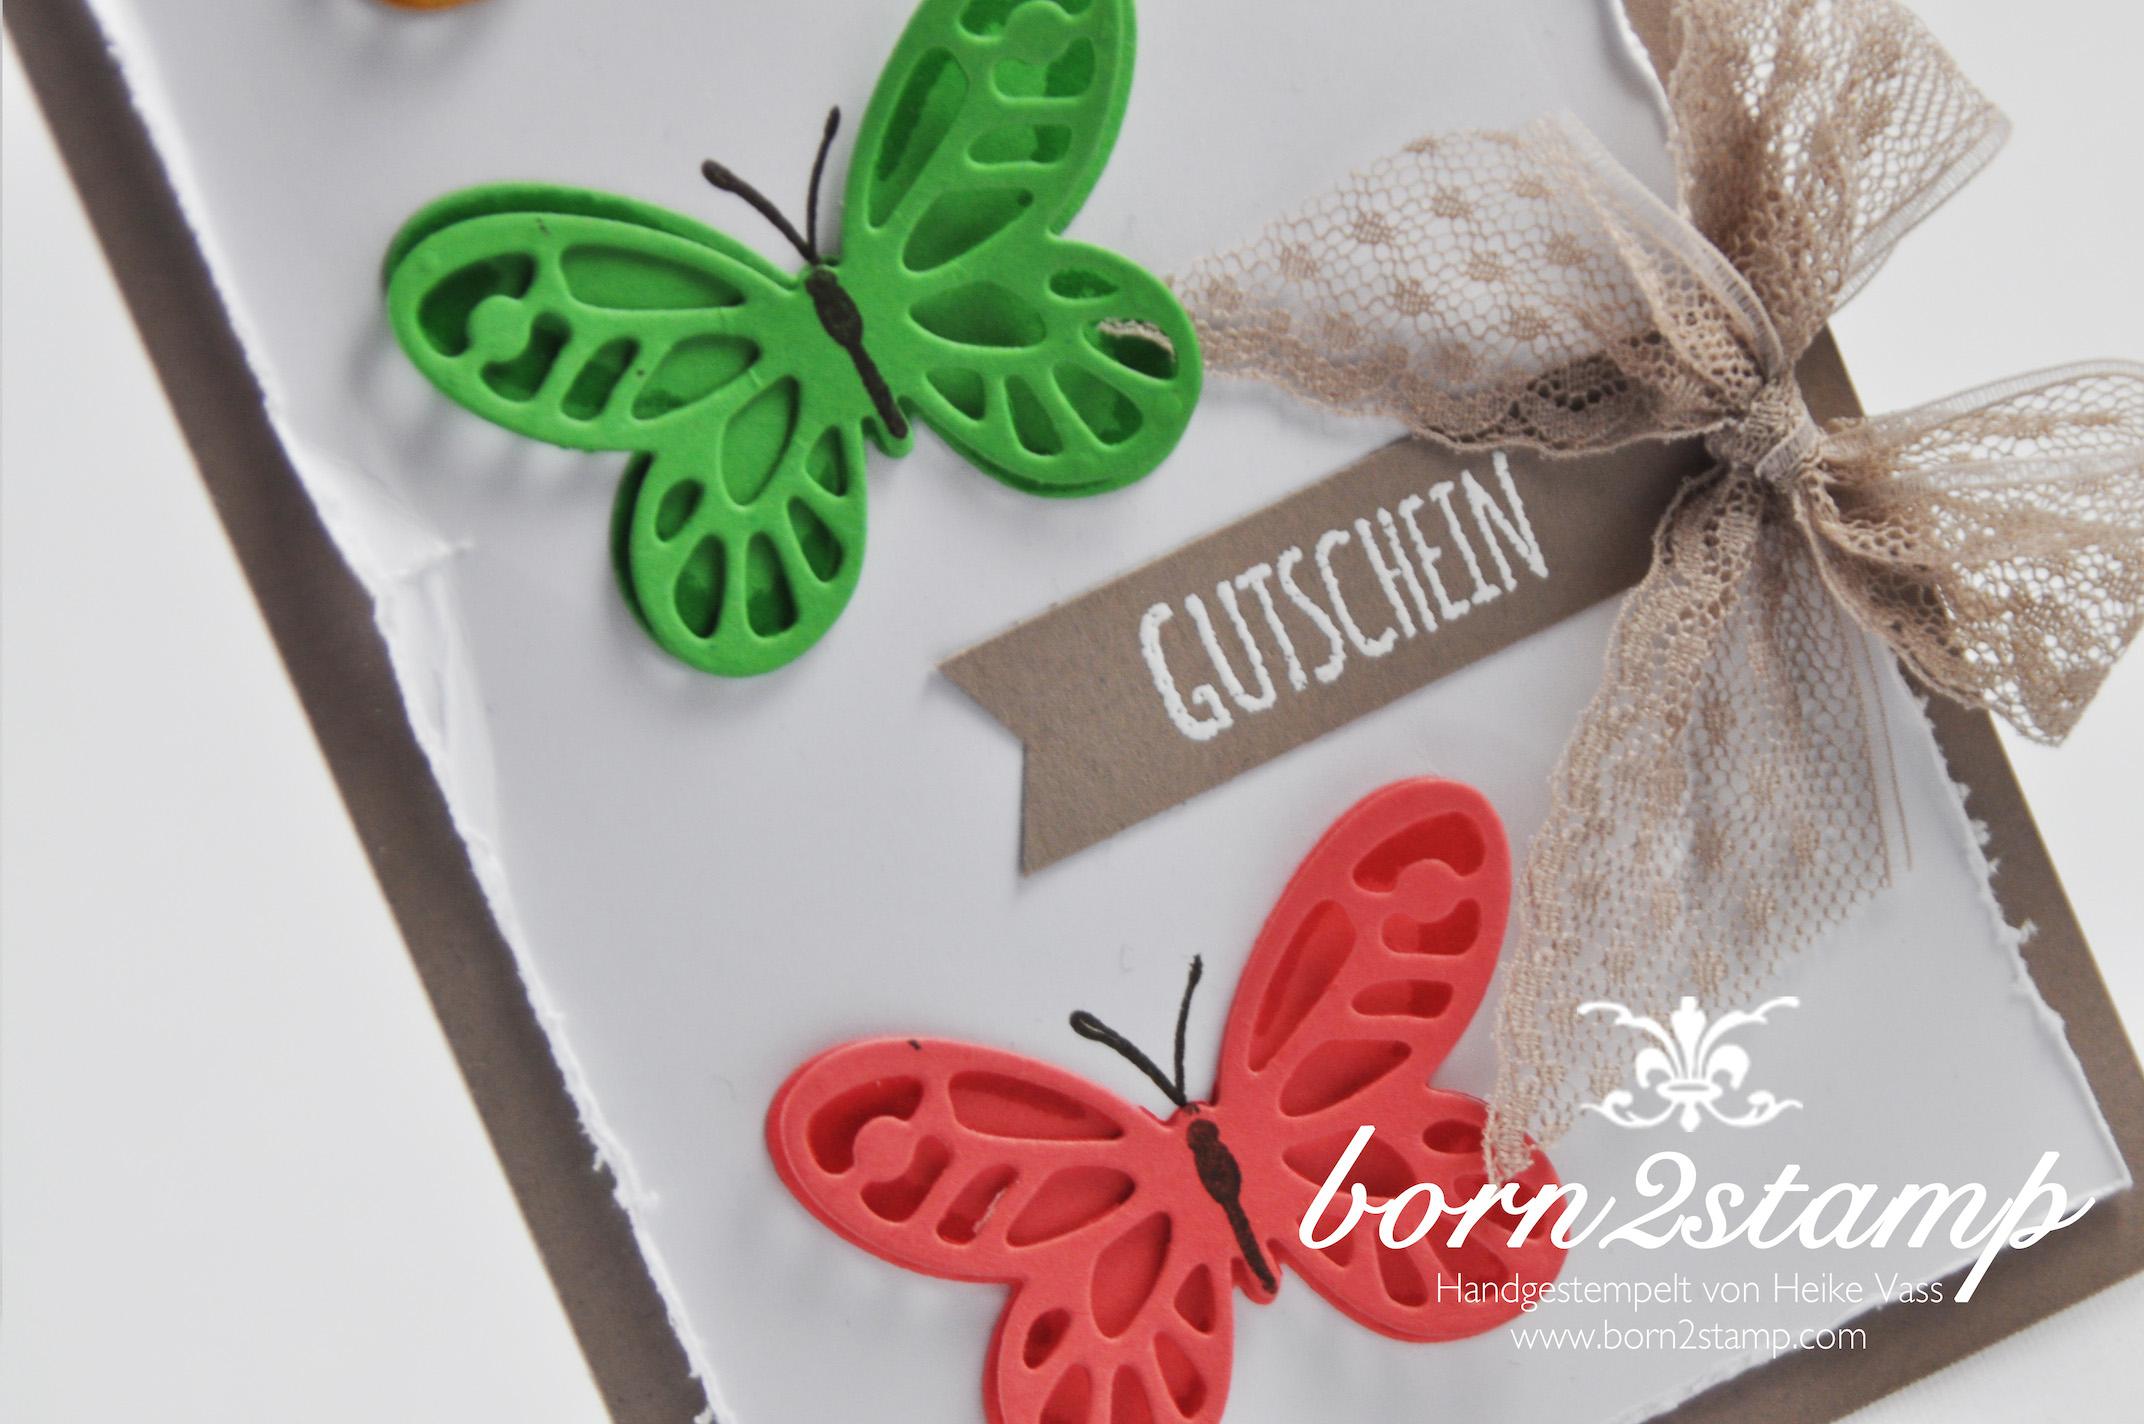 STAMPIN' UP! born2stamp Gutschein – Watercolor wings – Butterfies Thinlits – Bold Butterfly Framelits – Mit Liebe geschenkt – Puenktchen-Spitzenband